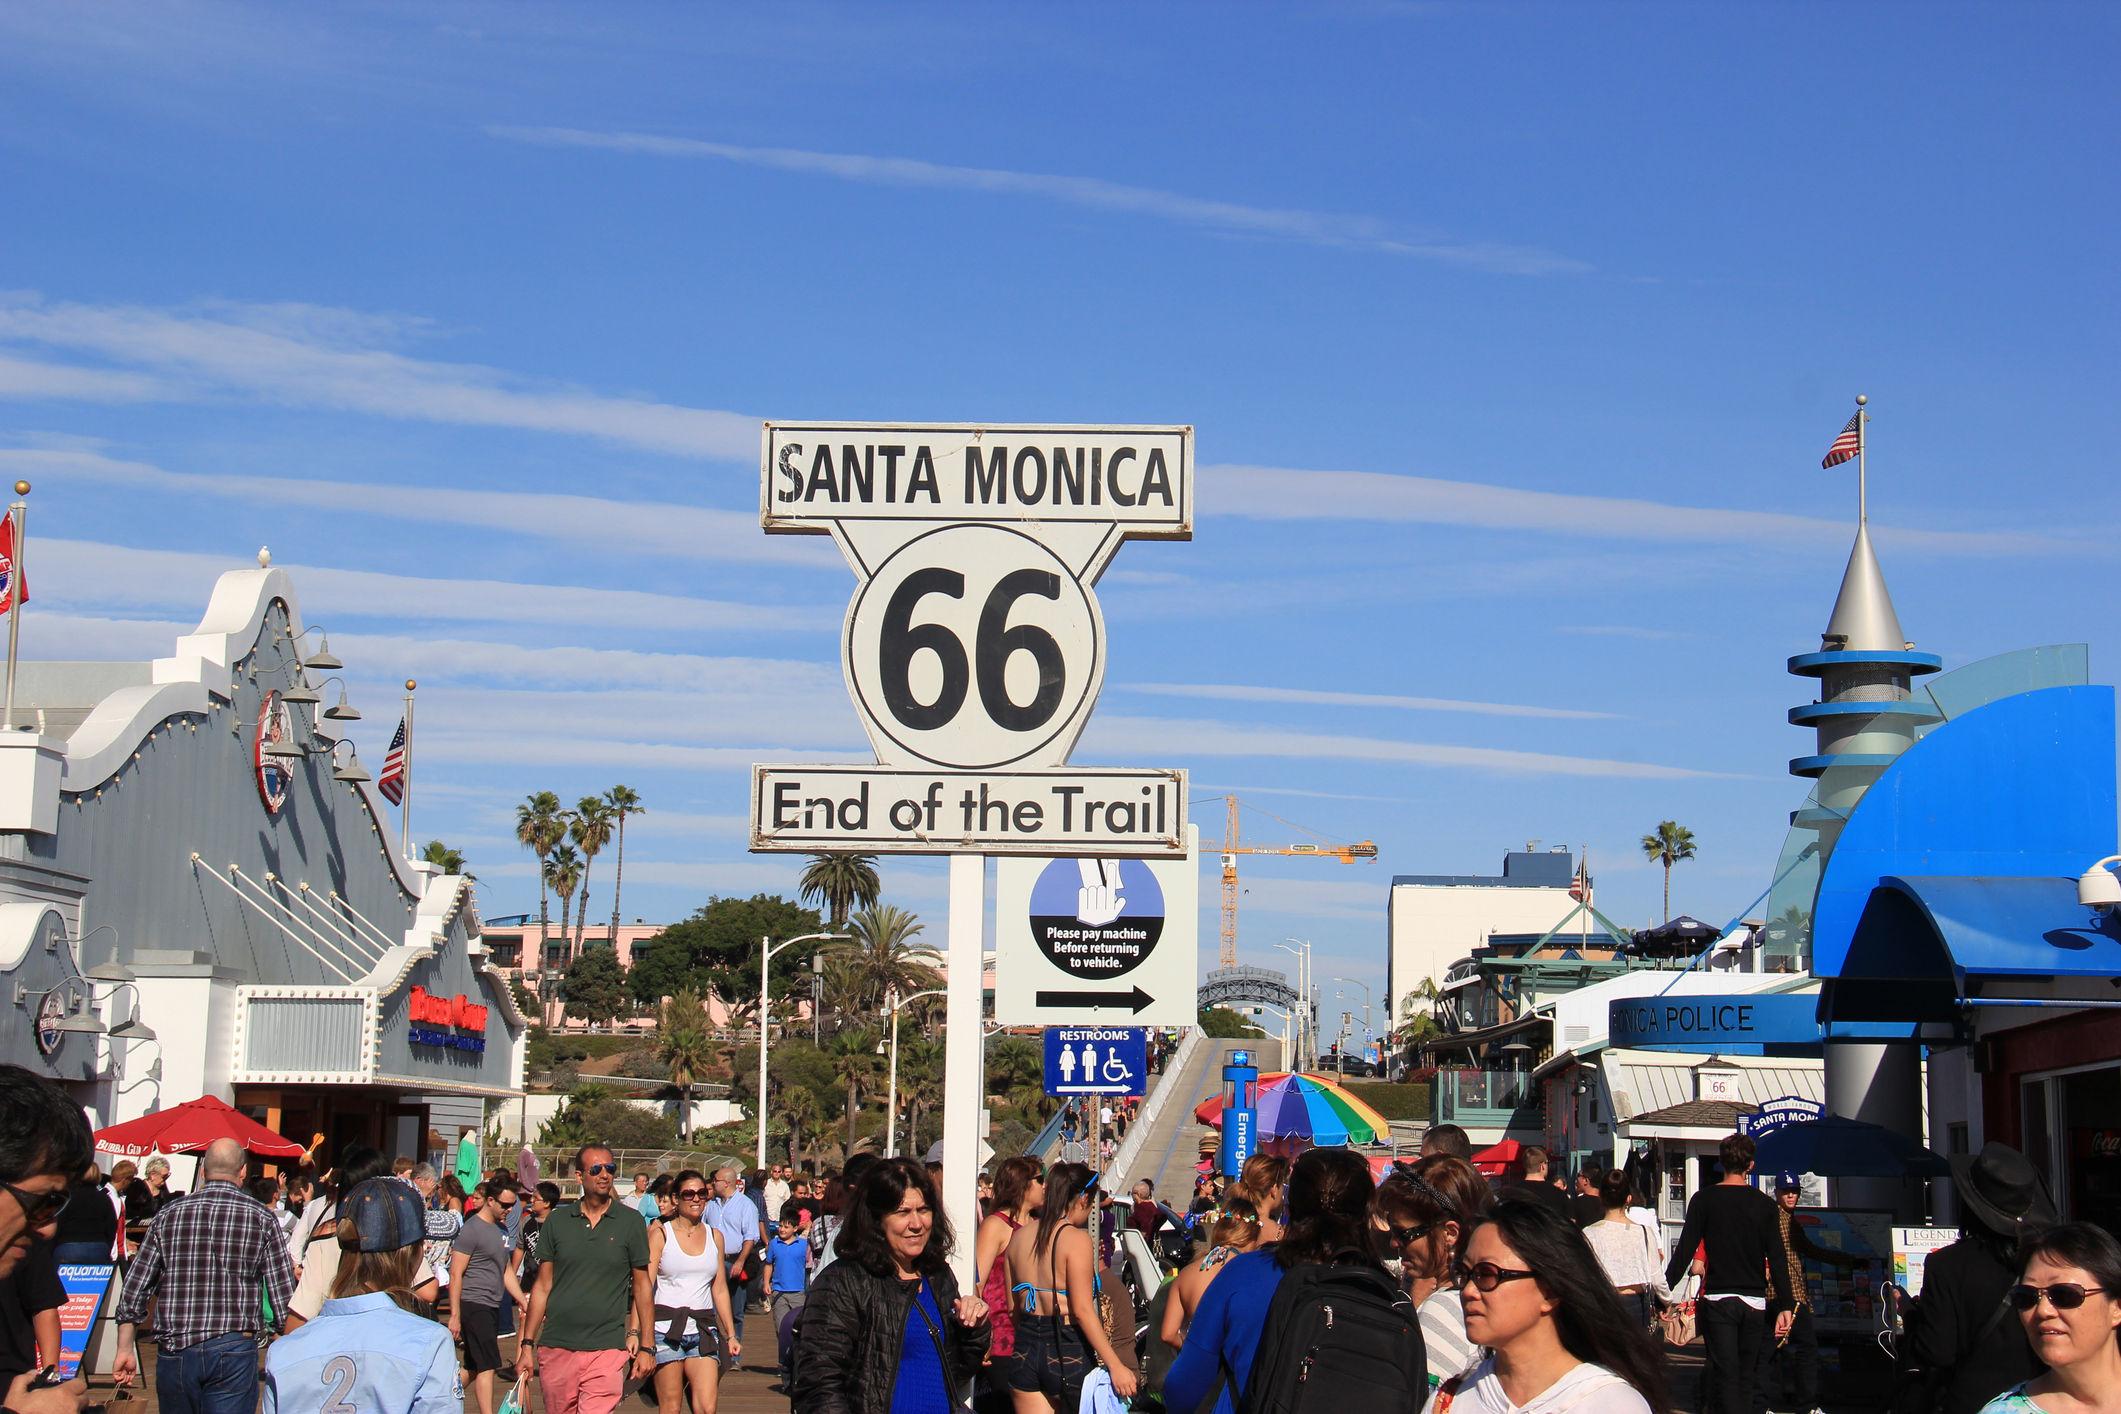 Santa Monica, Supannee Hickman | istockphoto.com/